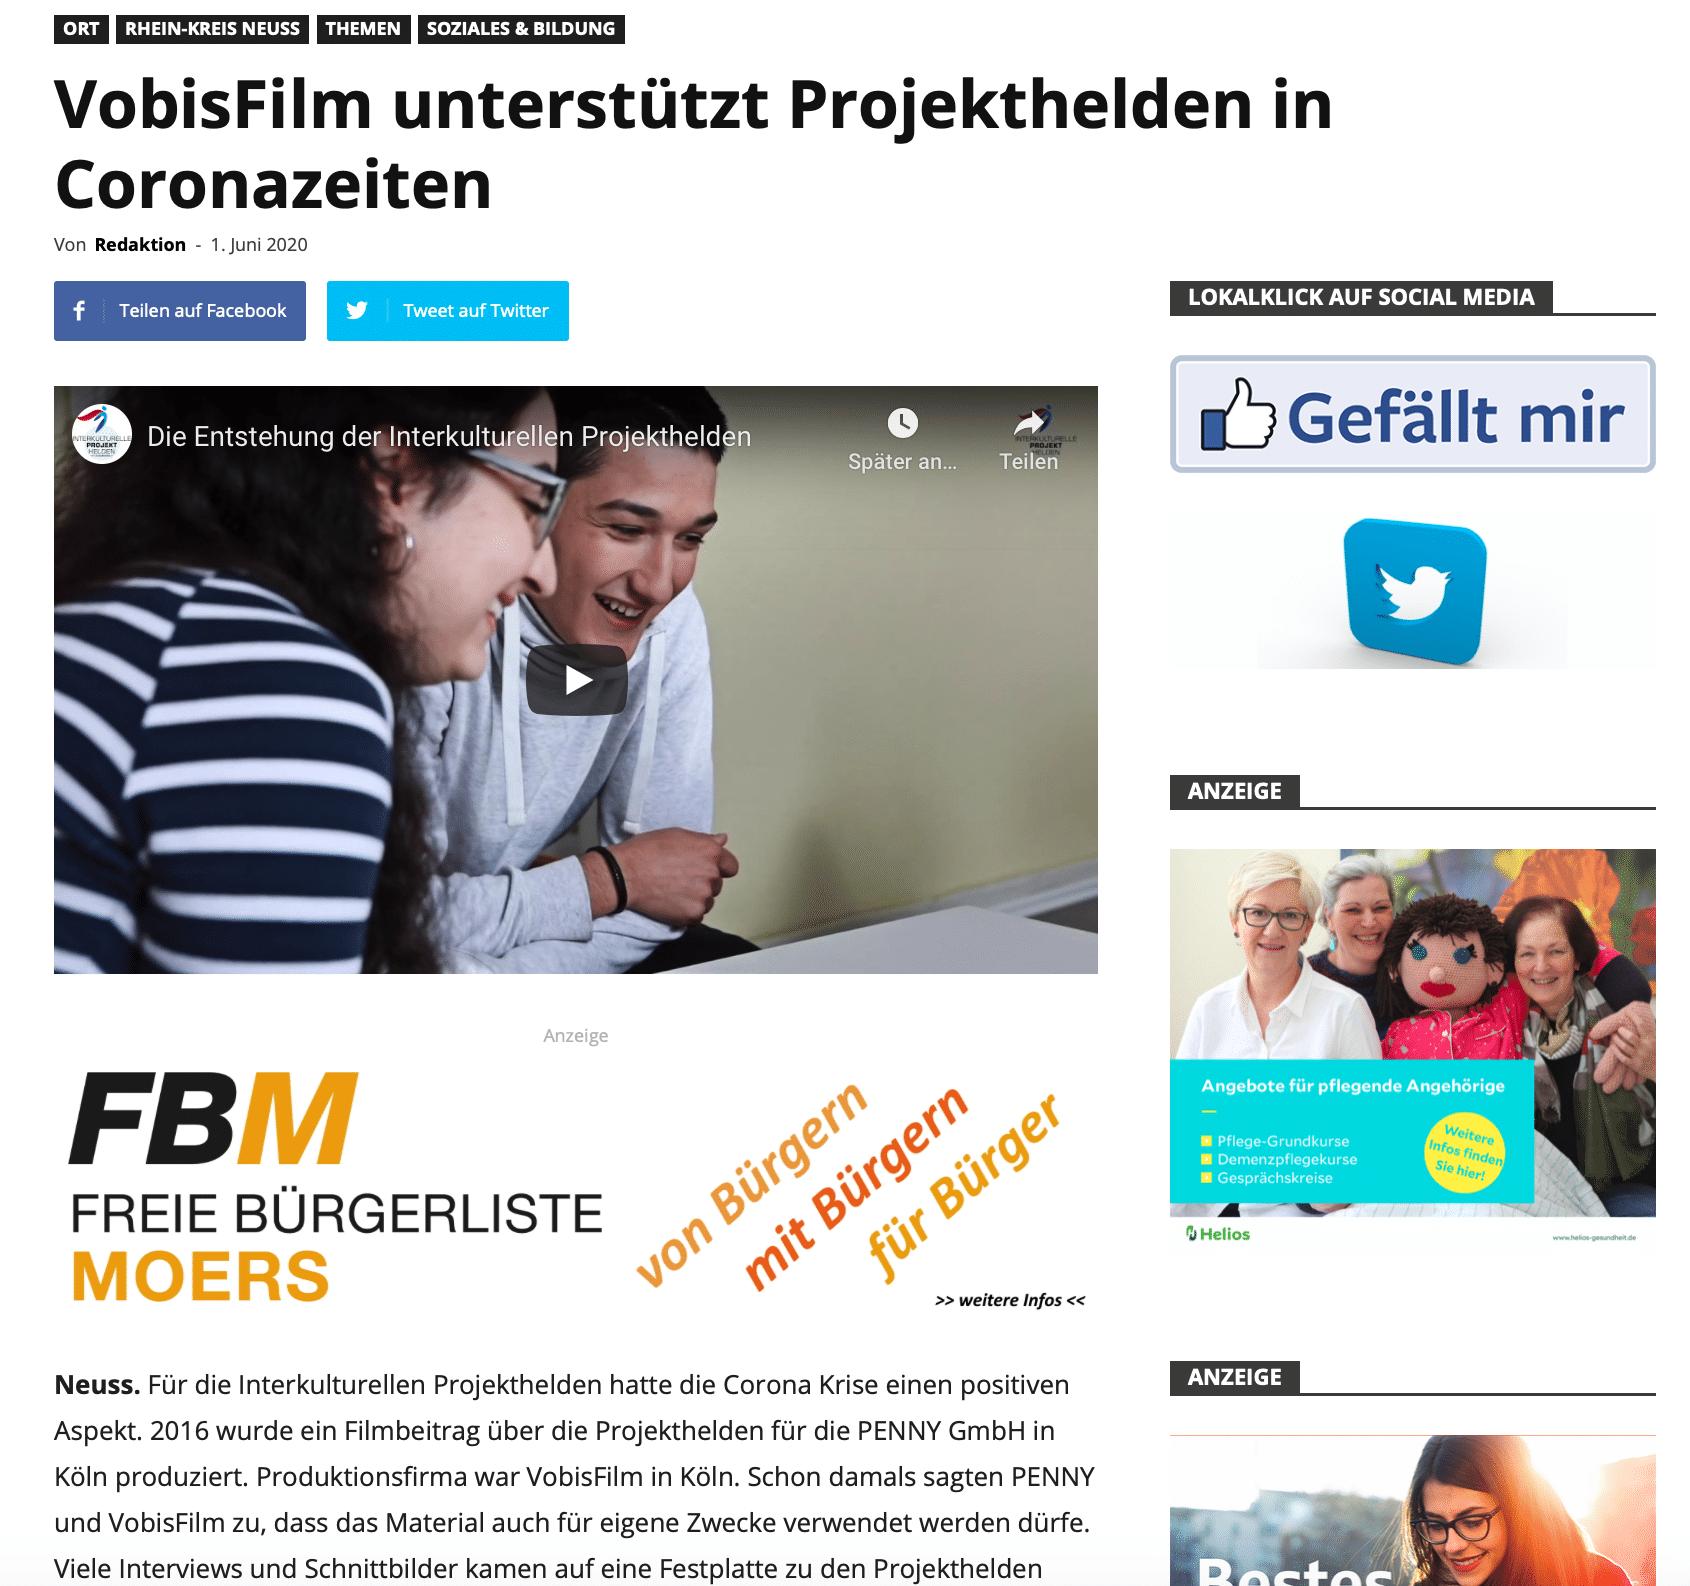 Interkulturelle Projekthelden